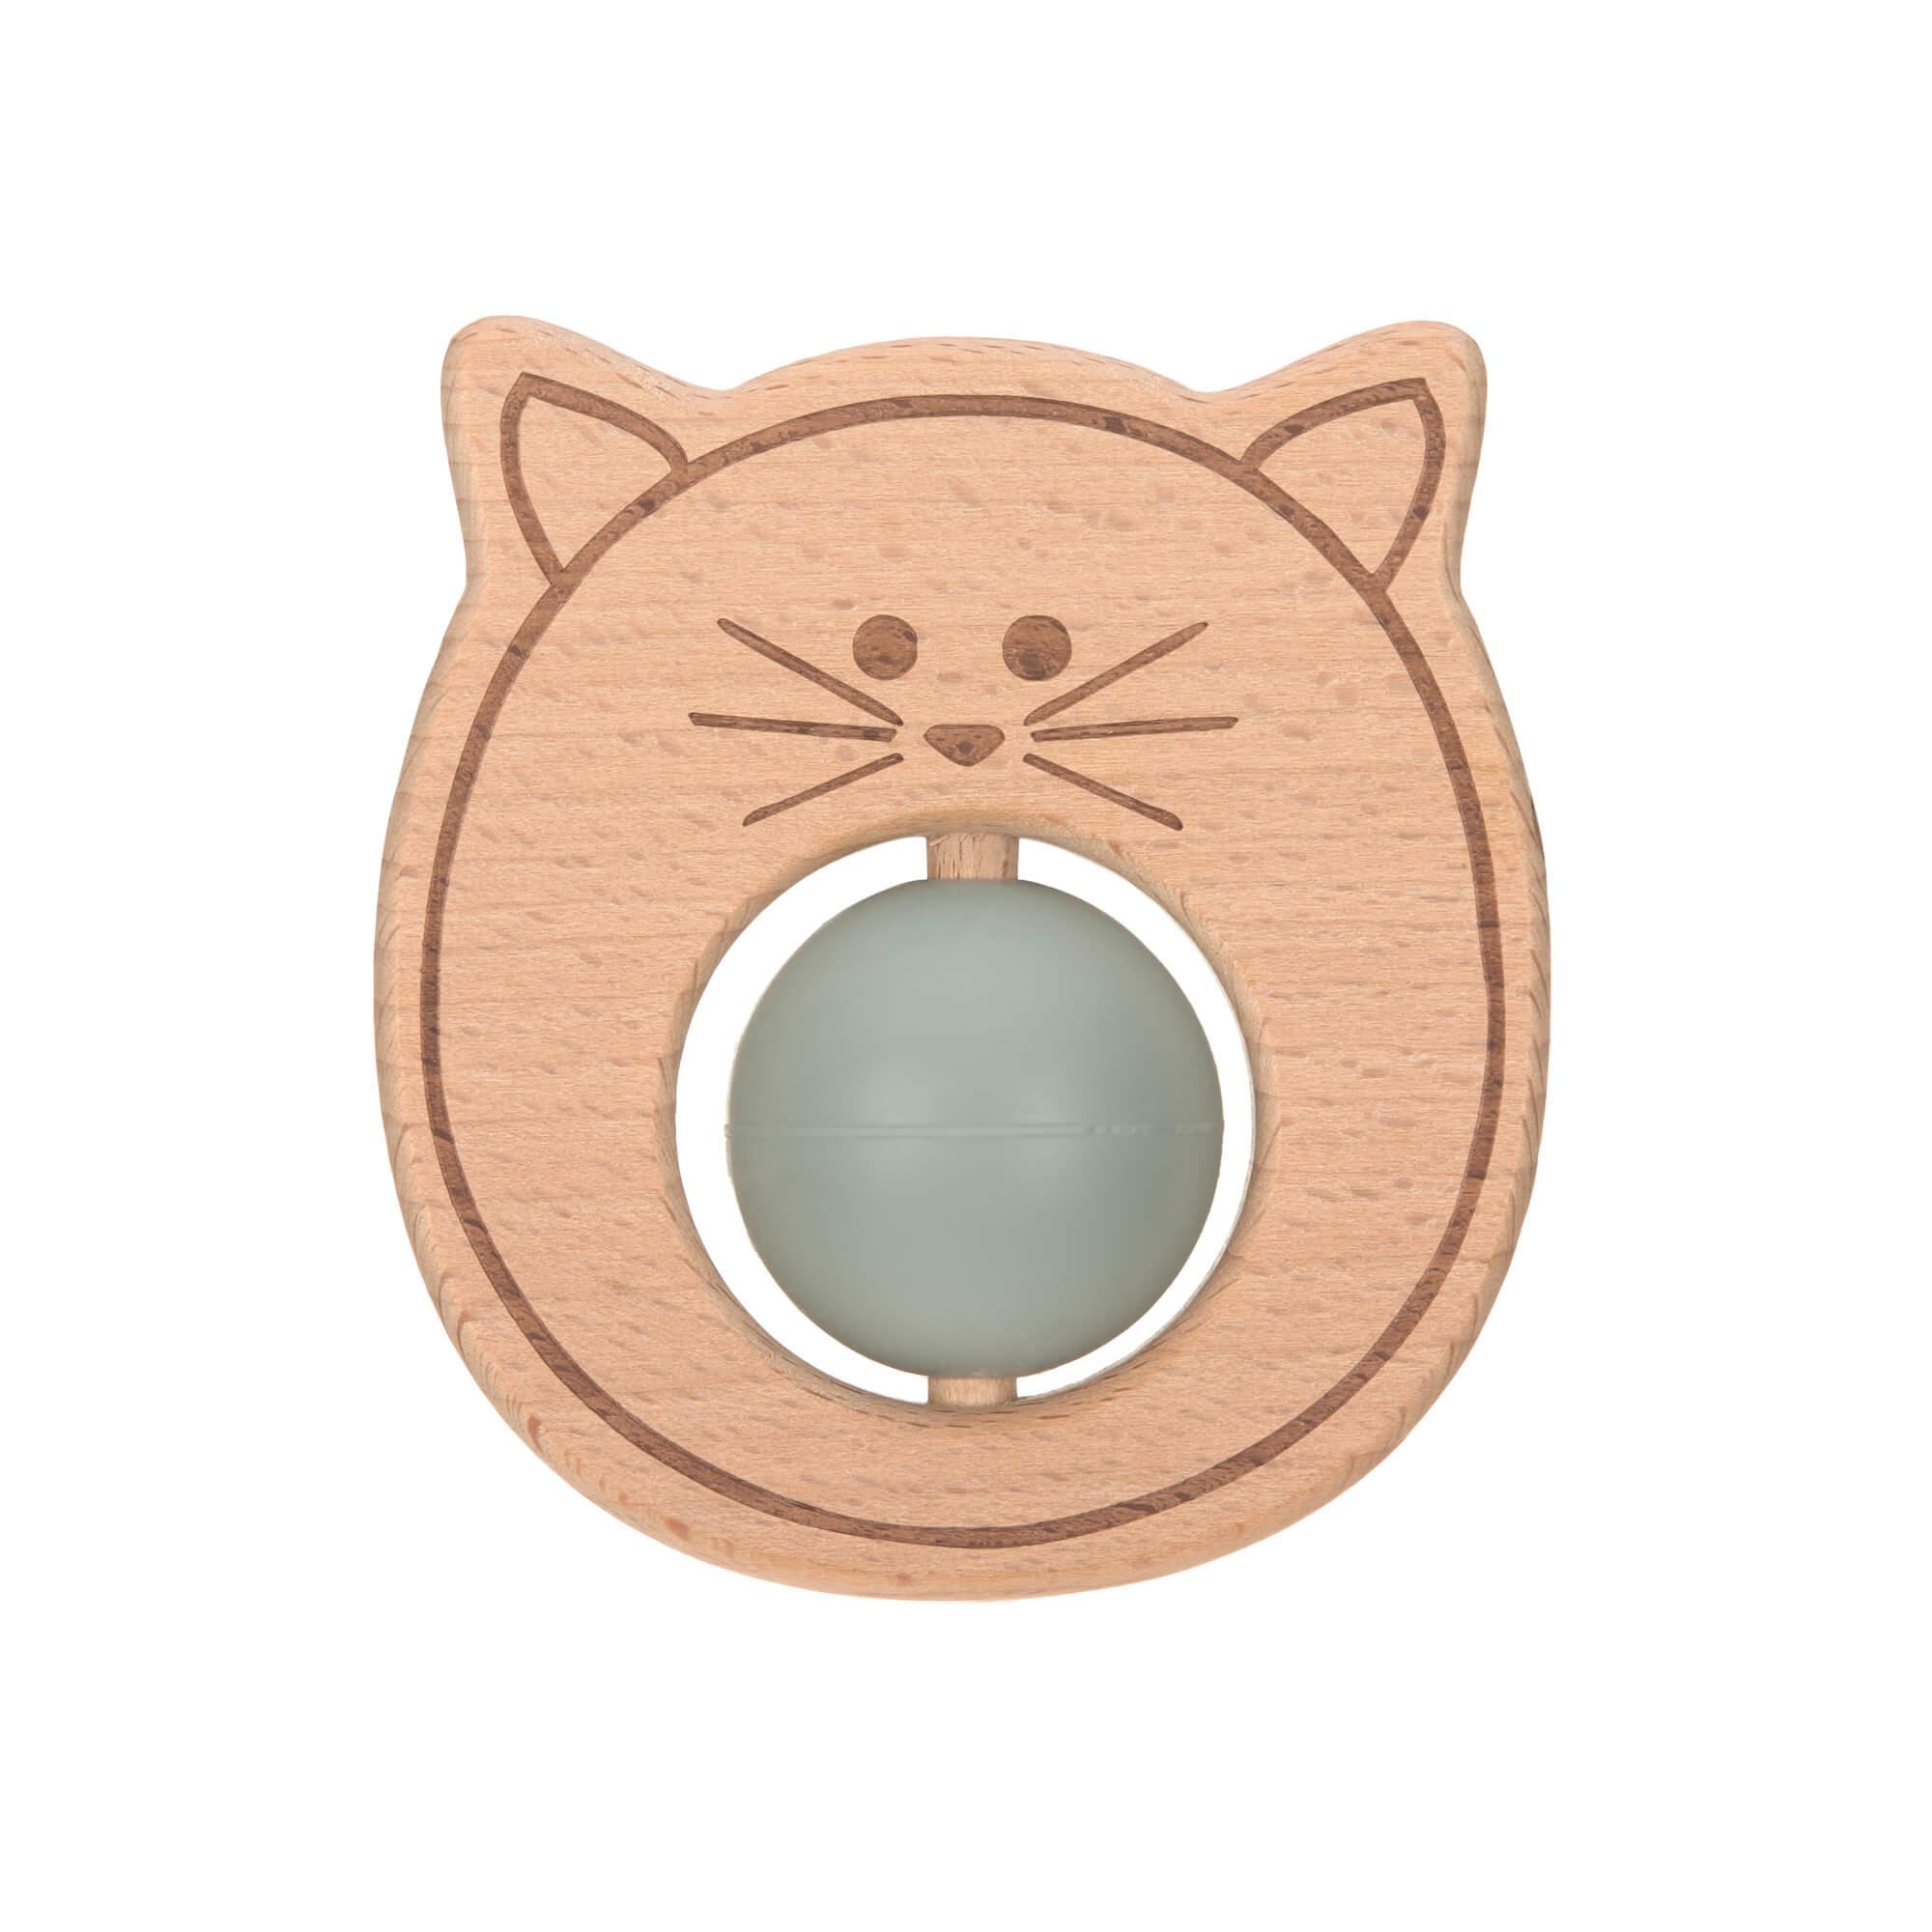 Greifling mit Beißhilfe - Little Chums Cat - Lässig